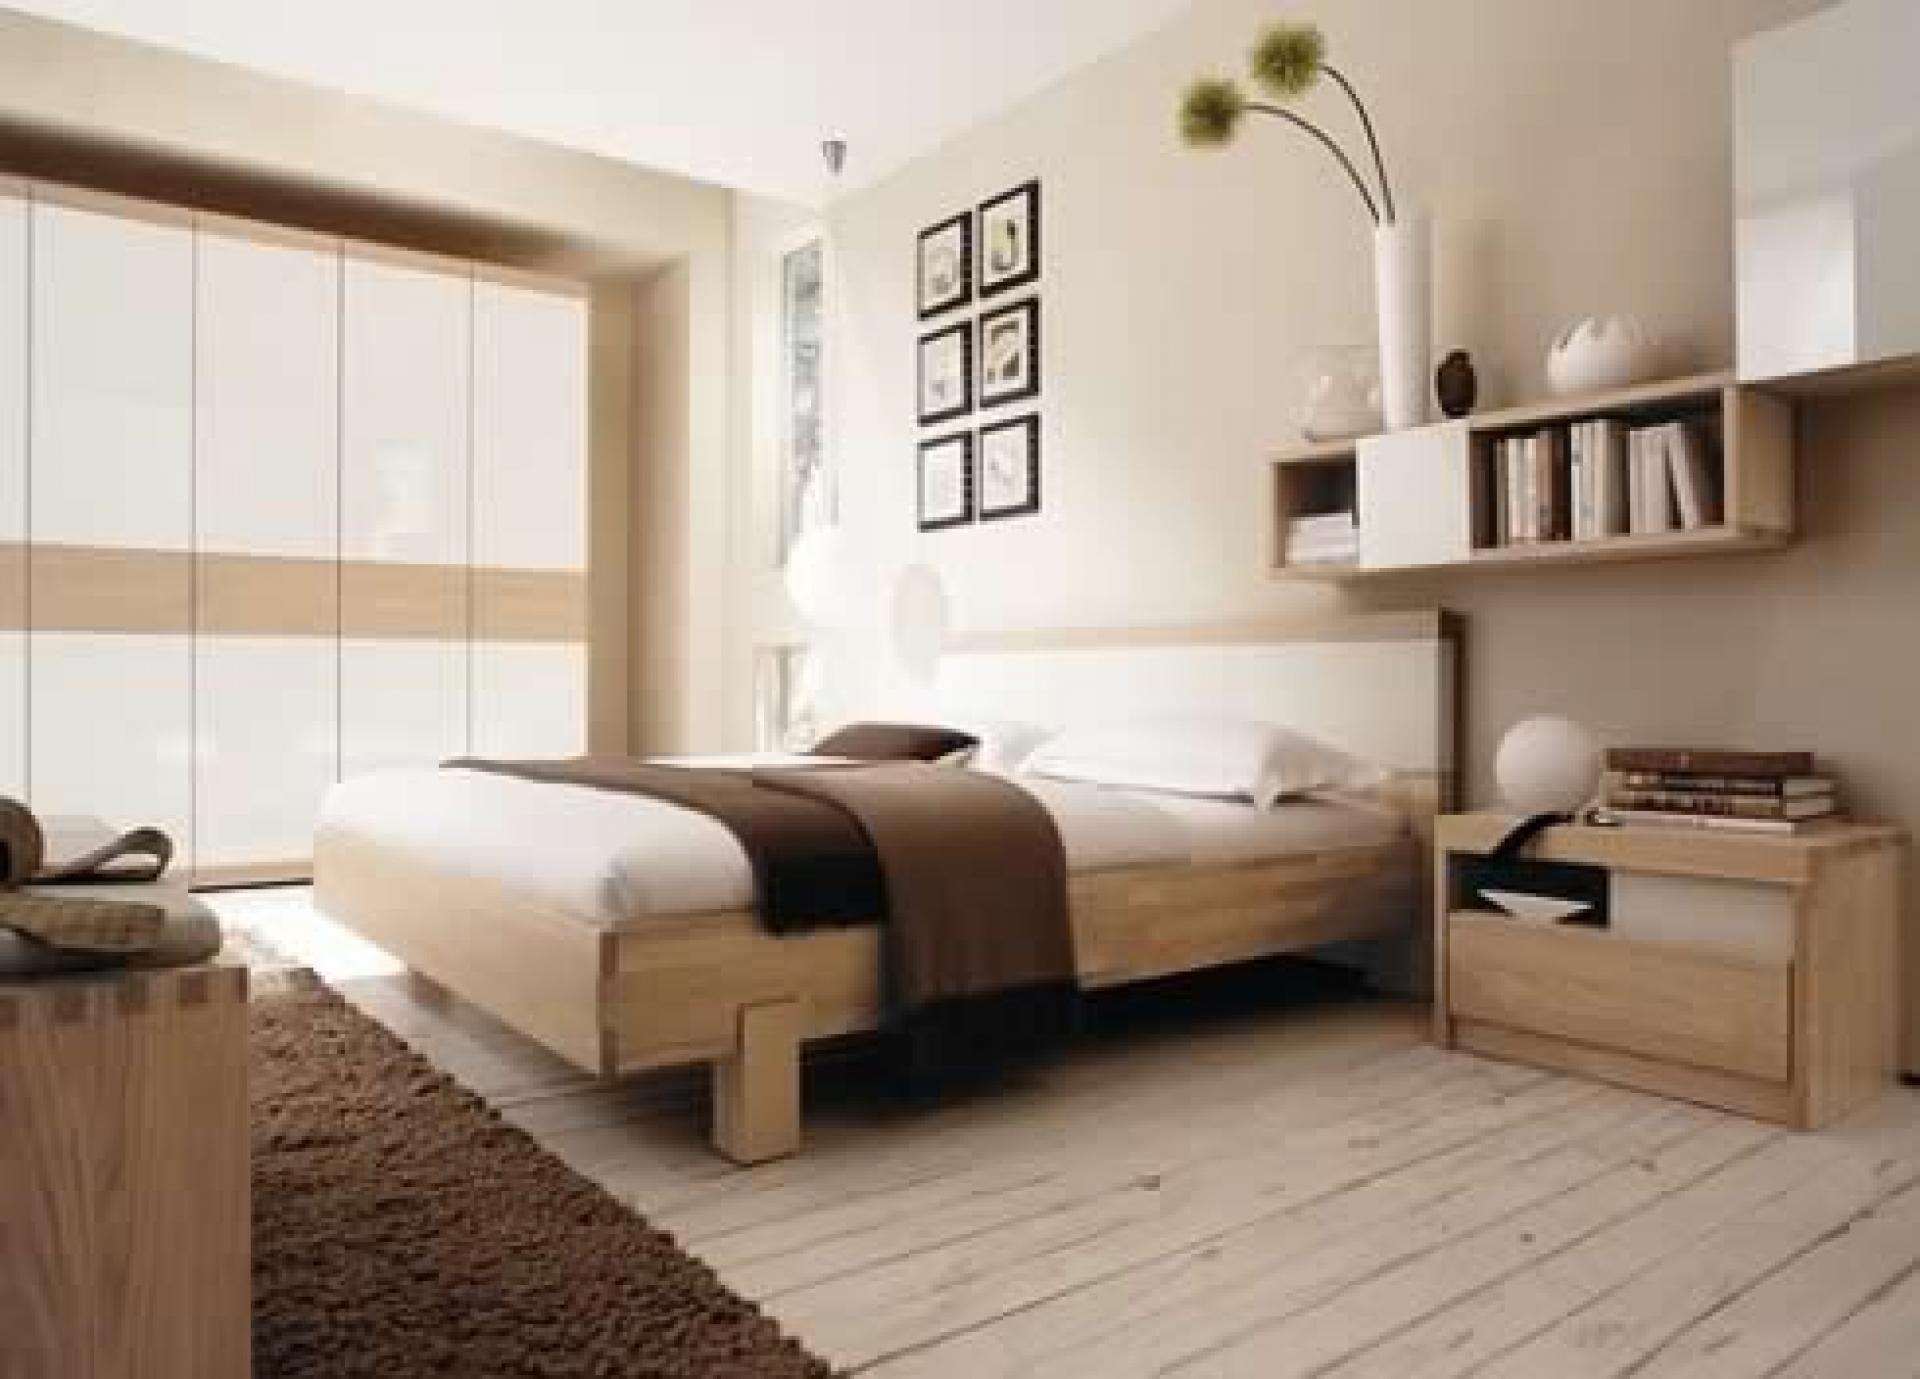 Cushion brown carpet feather wall book racks cabinet